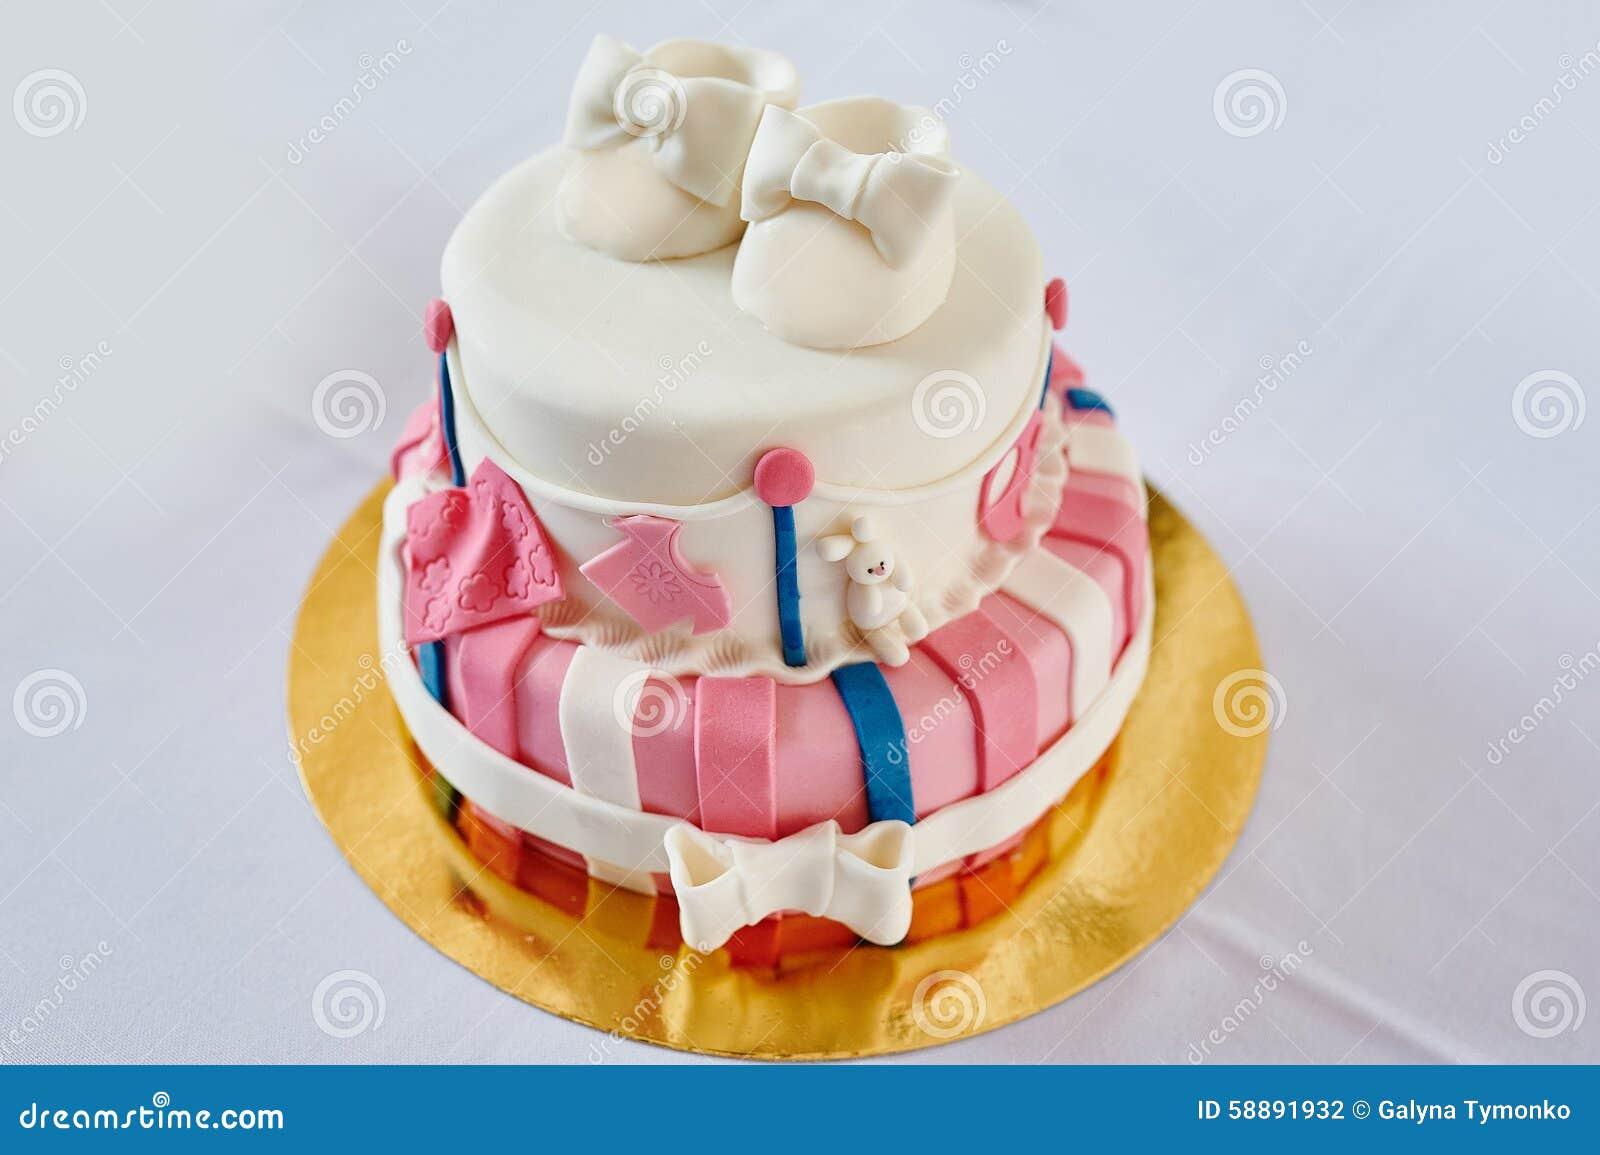 Beautiful Two Layer Pink And White Birthday Cake Stock Photo Image